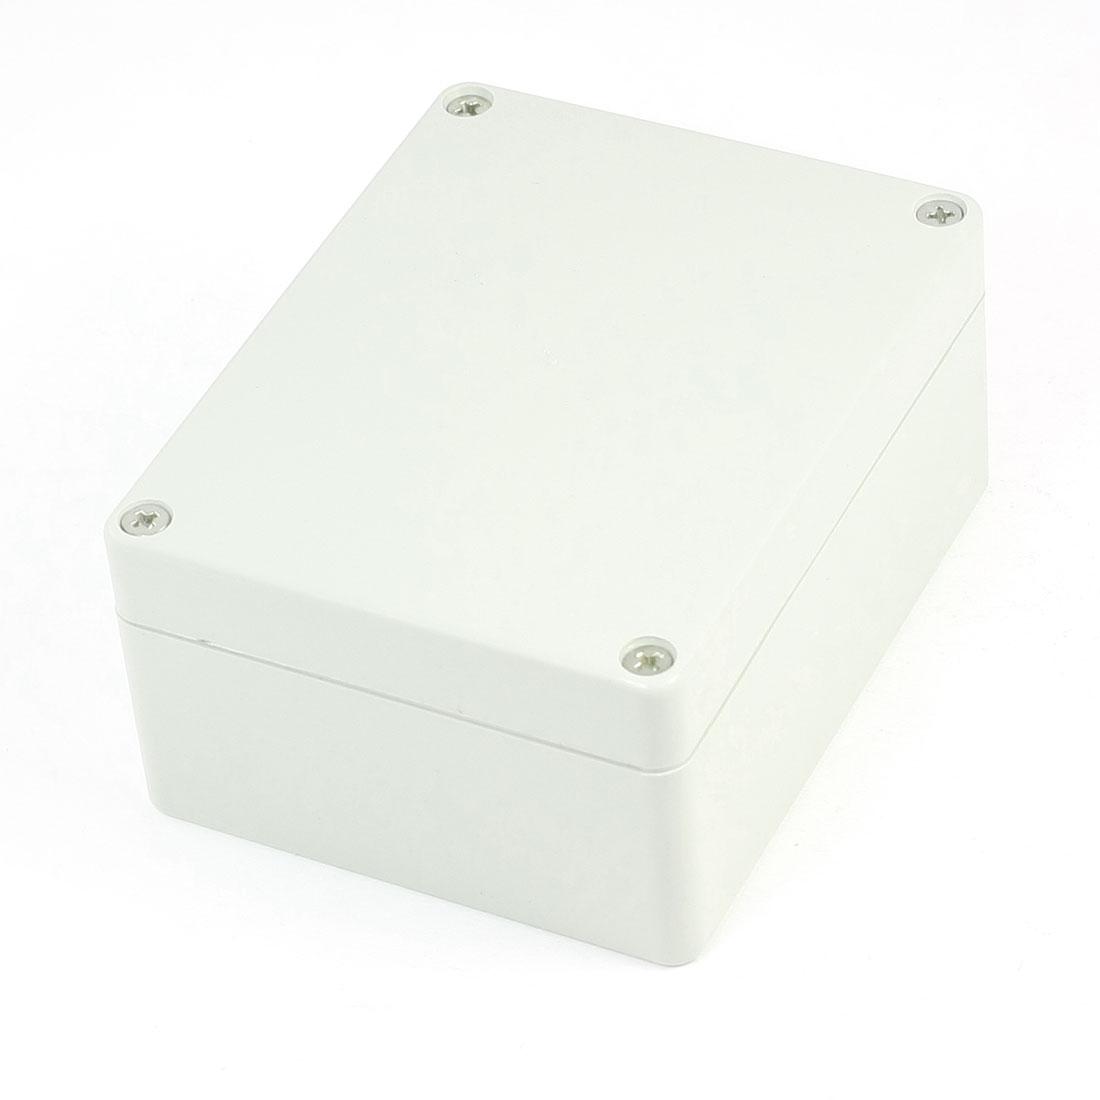 115mm x 90mm x 55mm Waterproof Plastic Enclosure Case DIY Junction Box